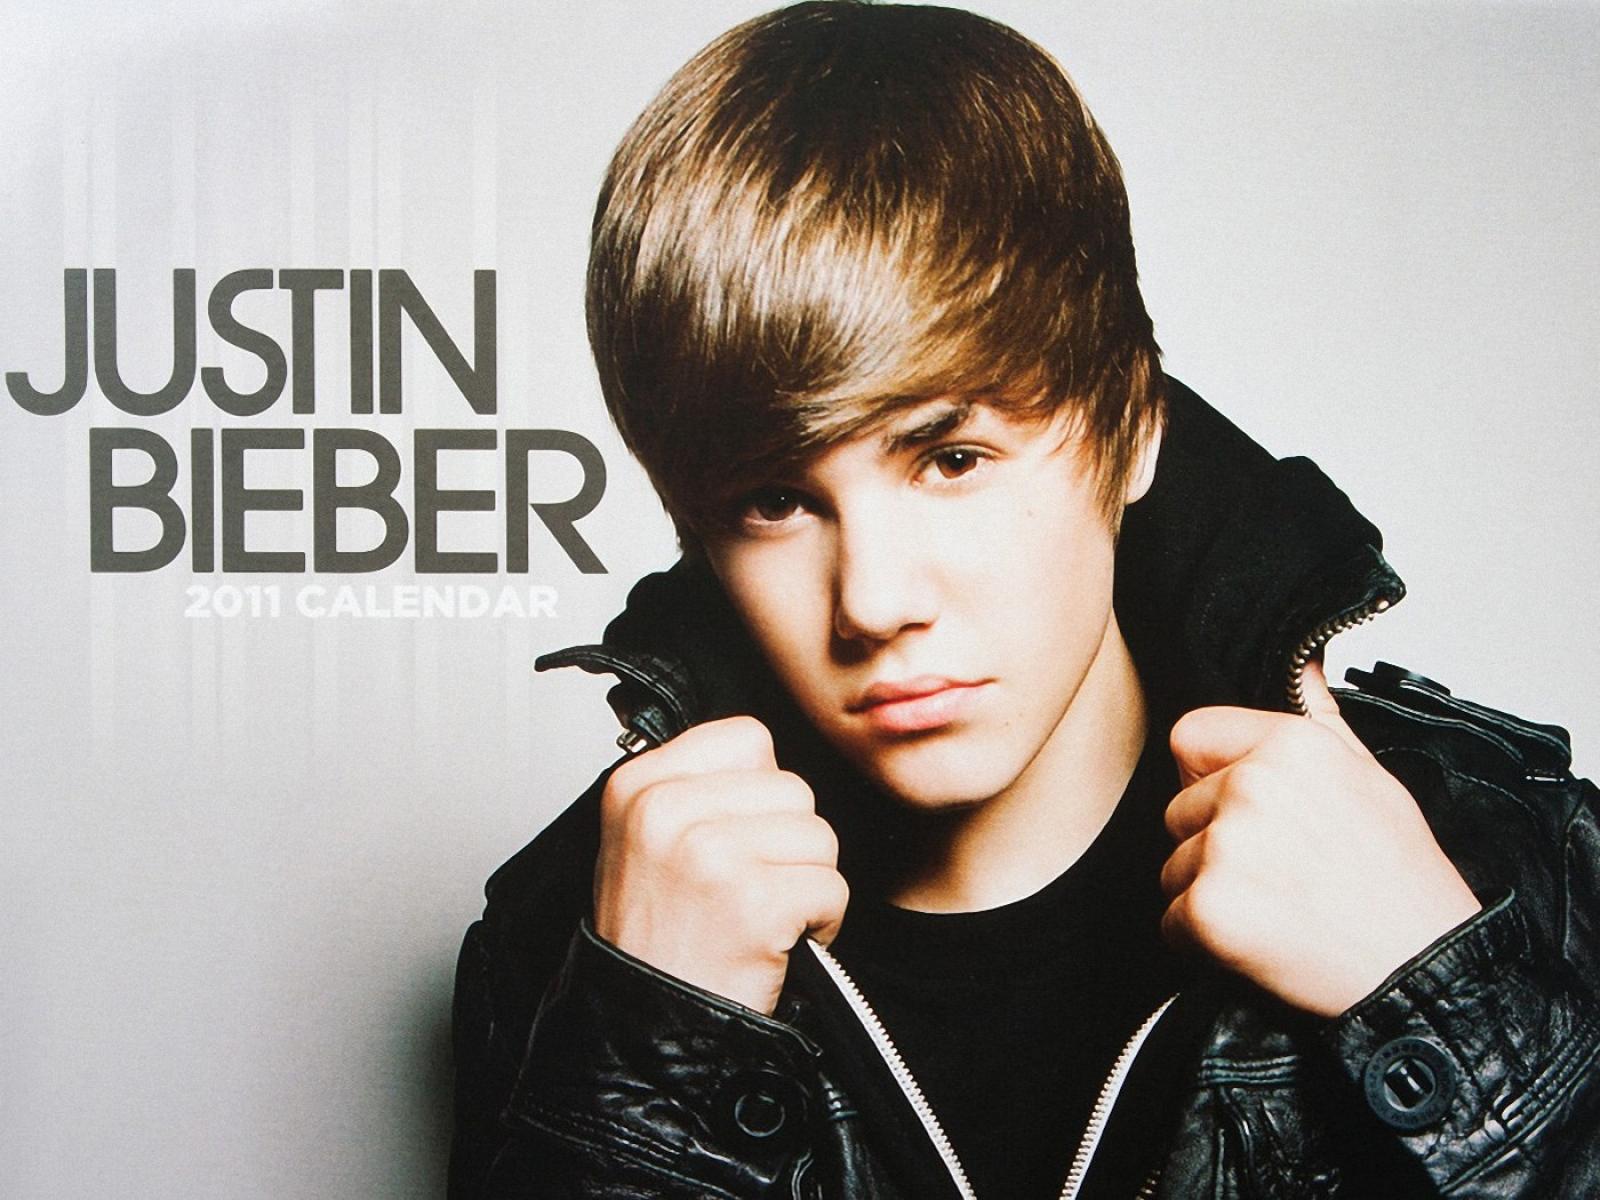 Hd wallpaper justin bieber - Justin Bieber Wallpaper 2371